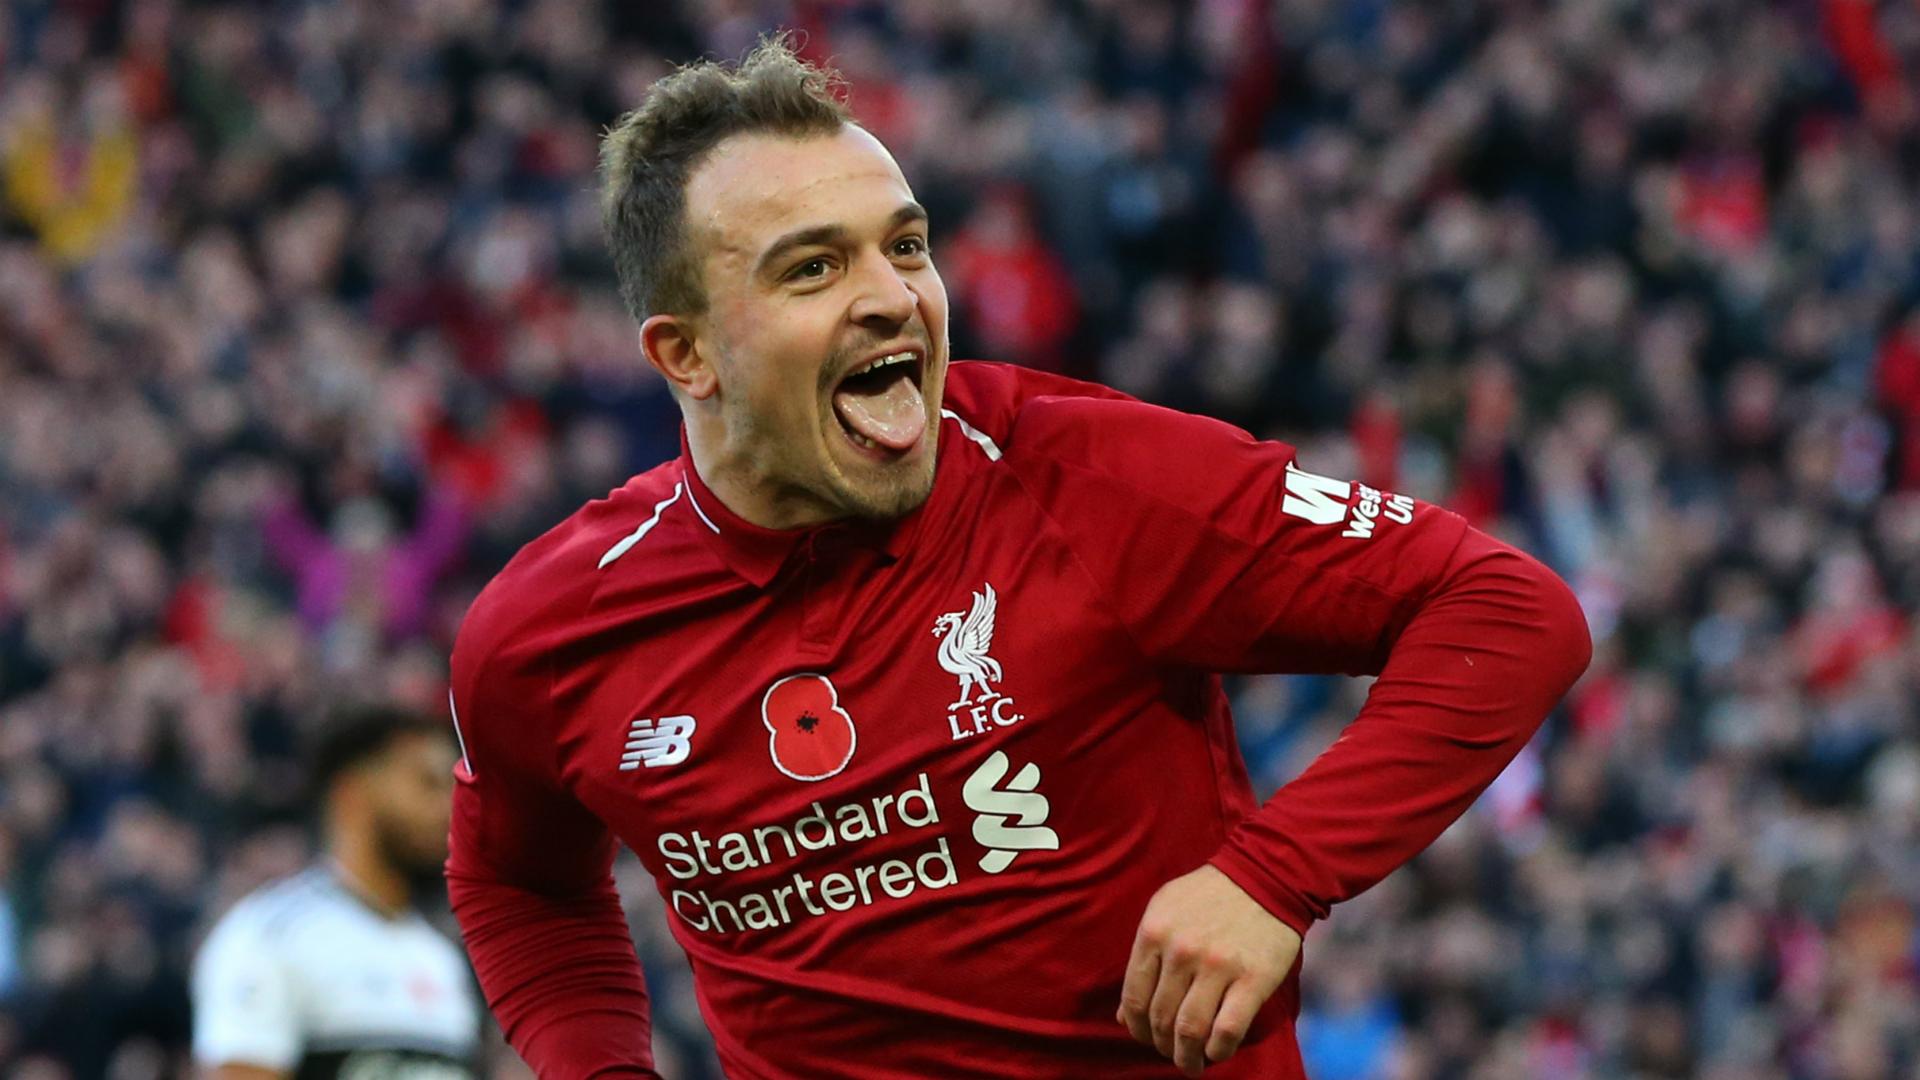 Liverpool v Everton: Shaqiri proving a cut-price Coutinho at Anfield